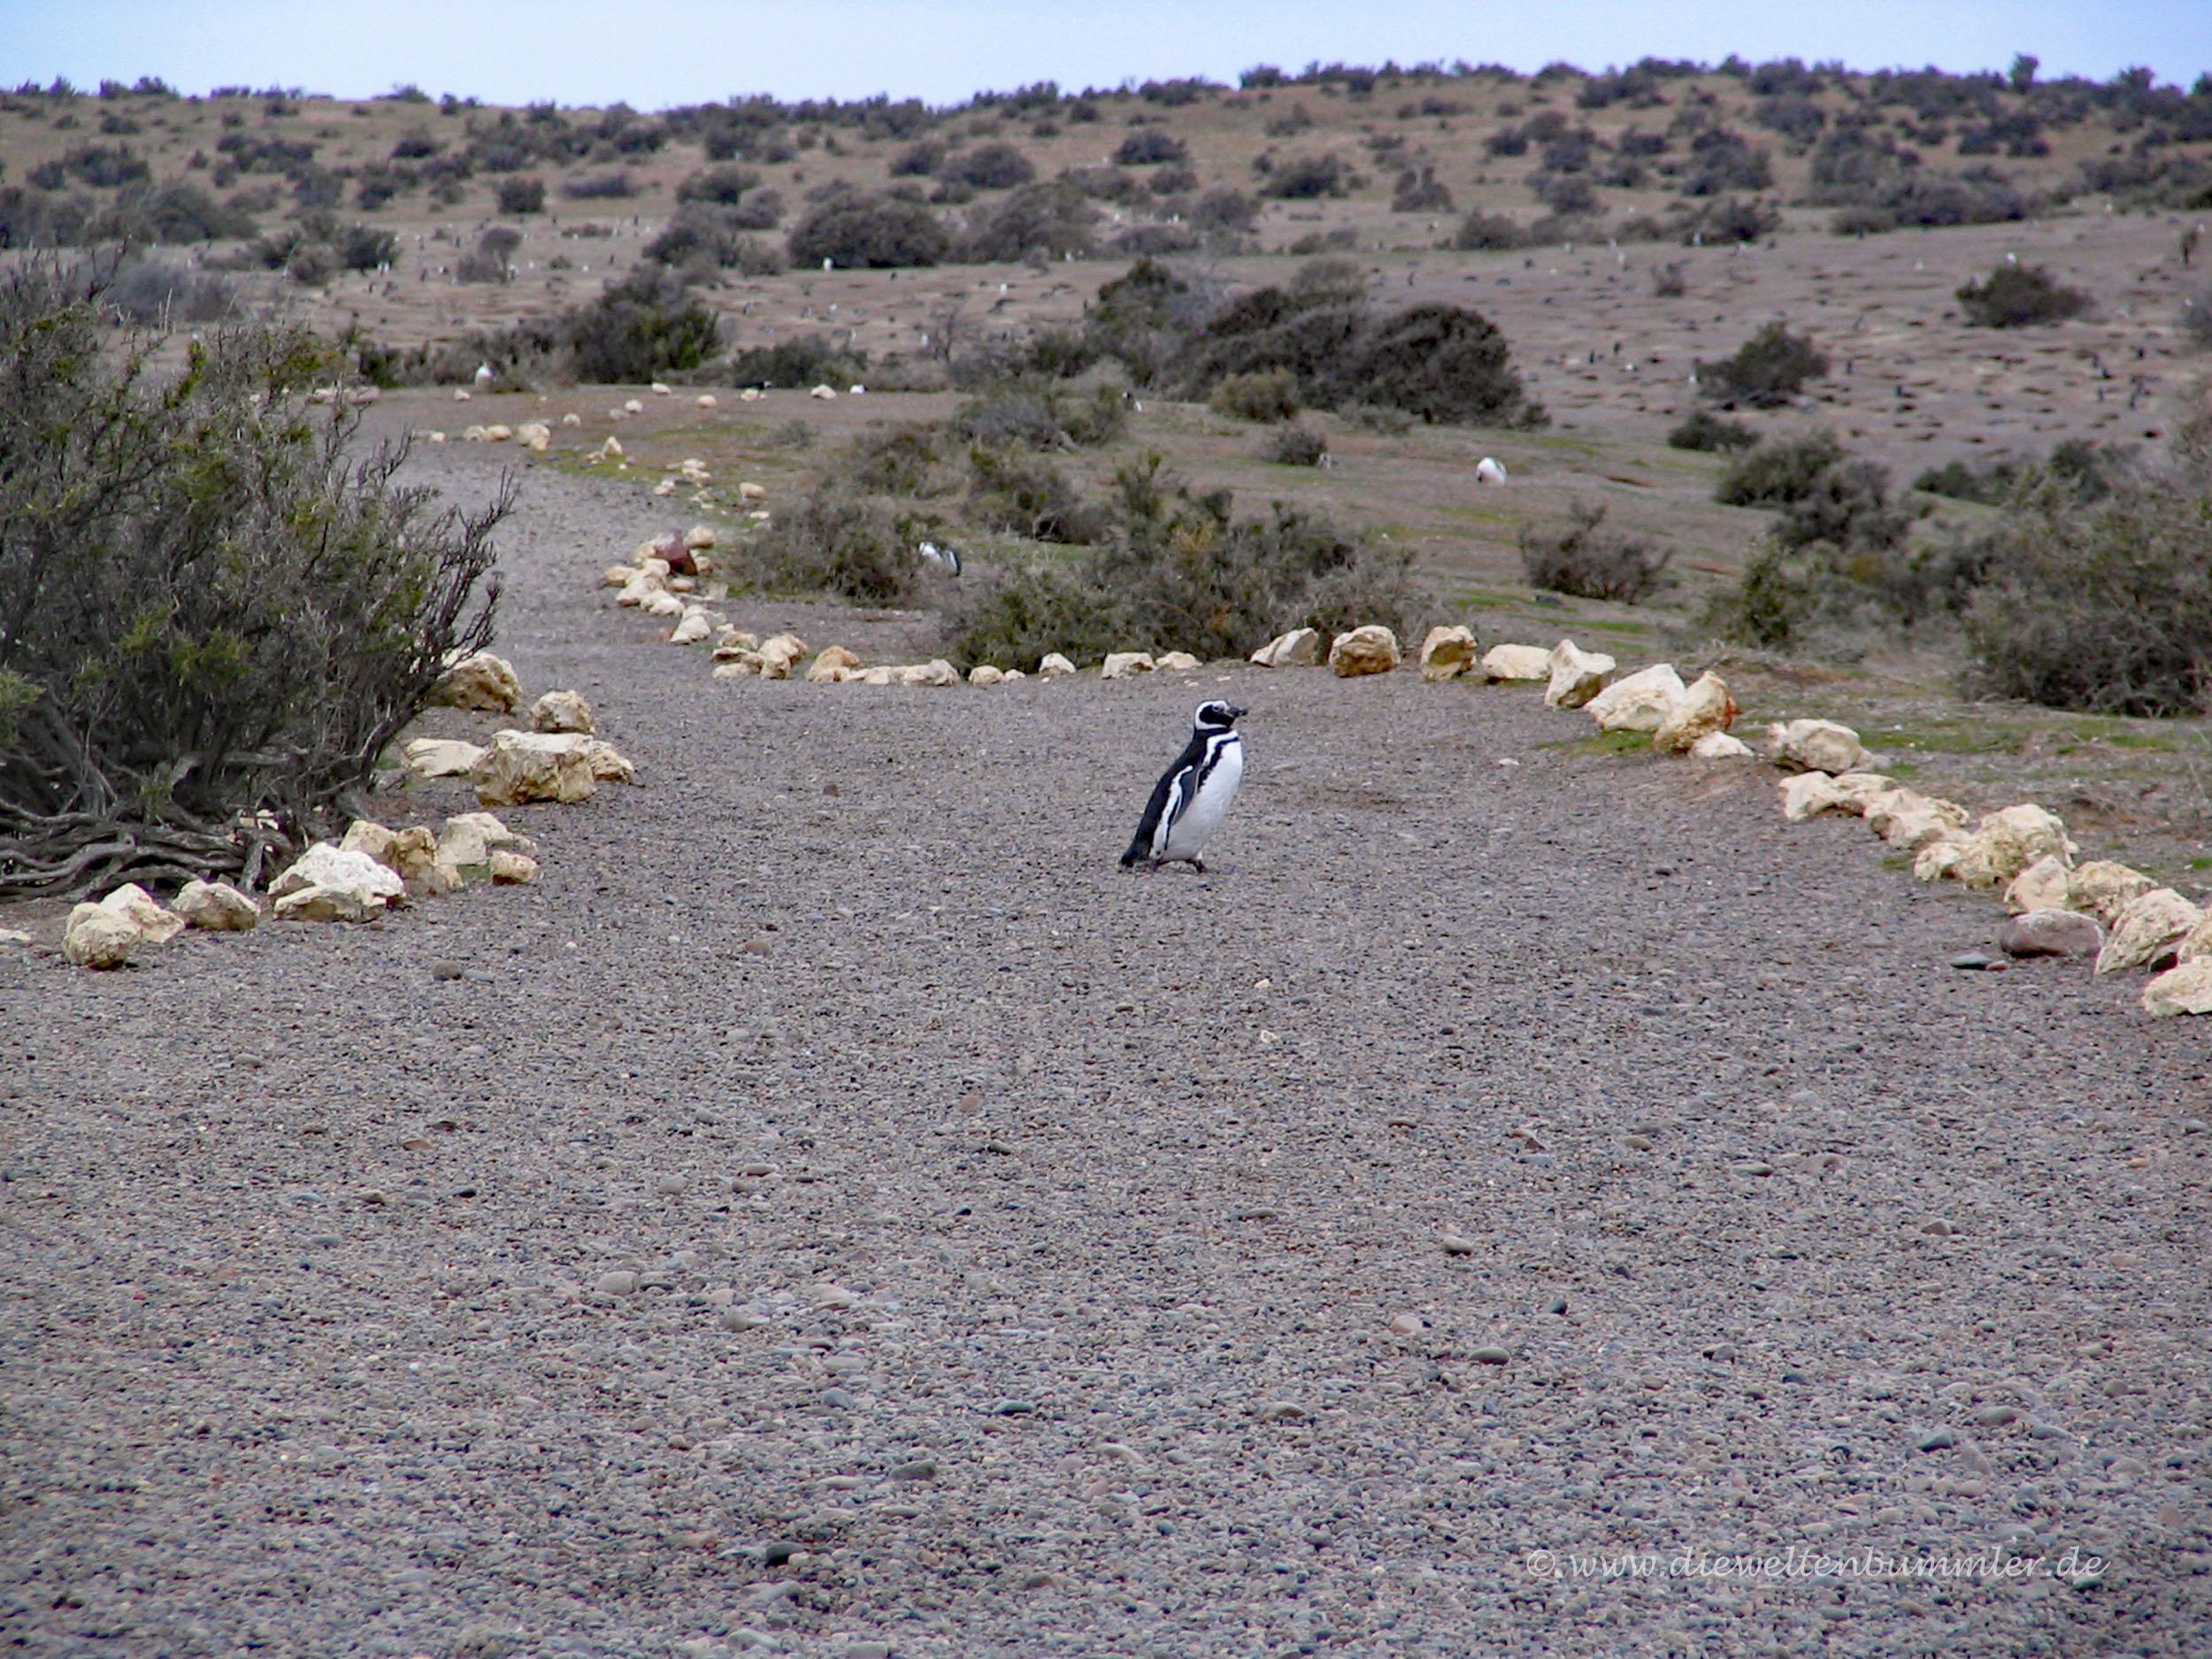 Pinguin auf dem Weg